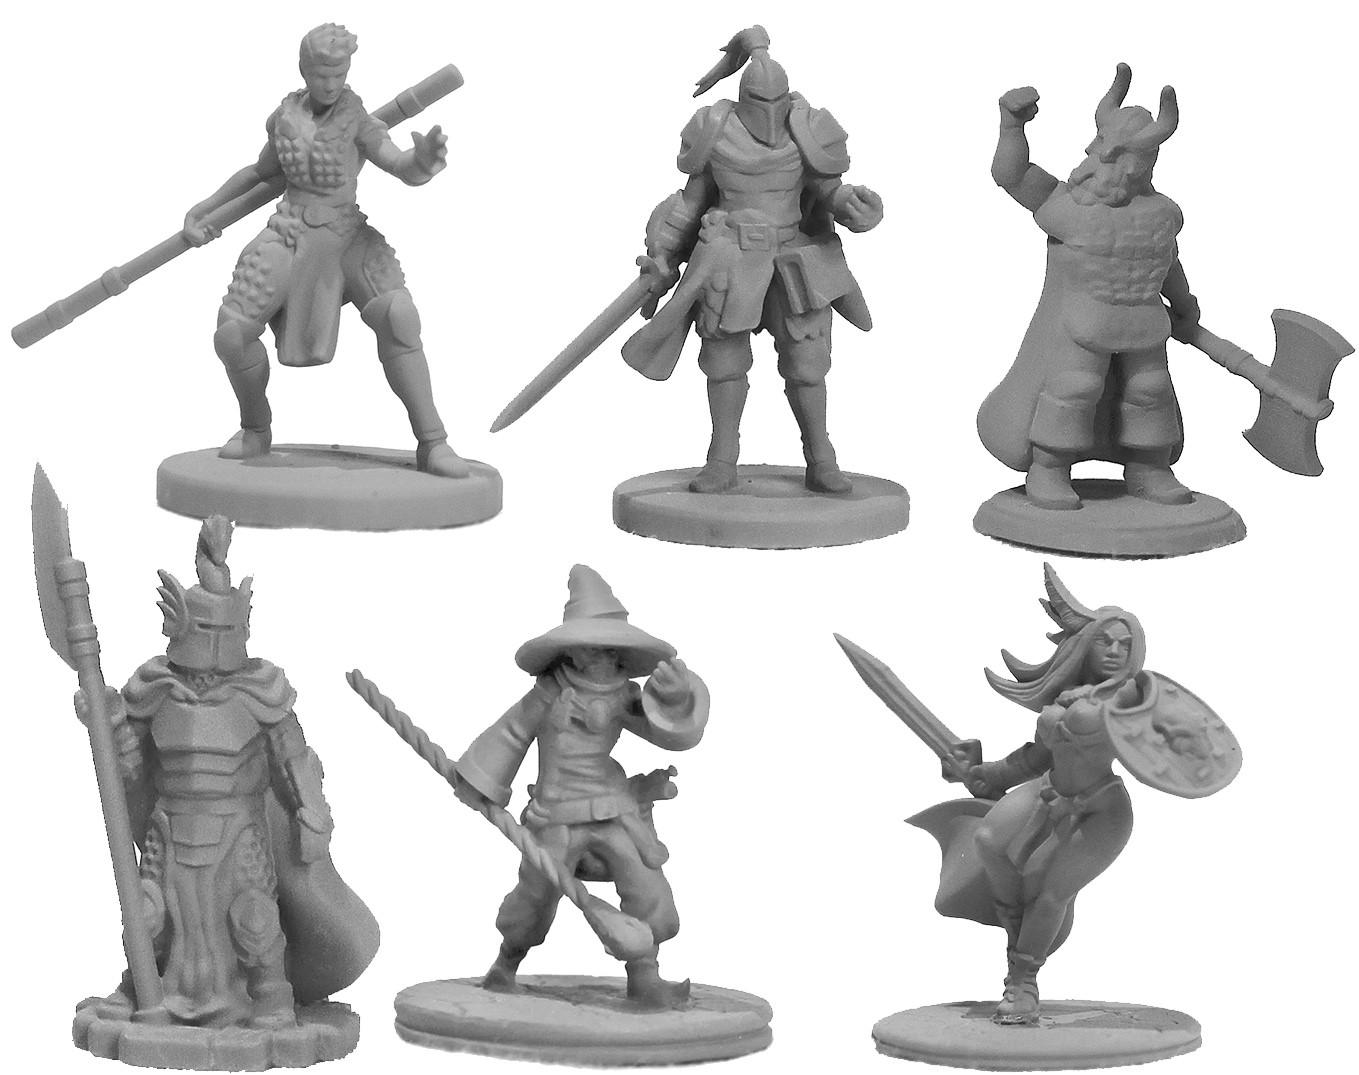 Set Heróis  - 6 miniaturas RPG Boargame Hobby pintura   - Dragon Store